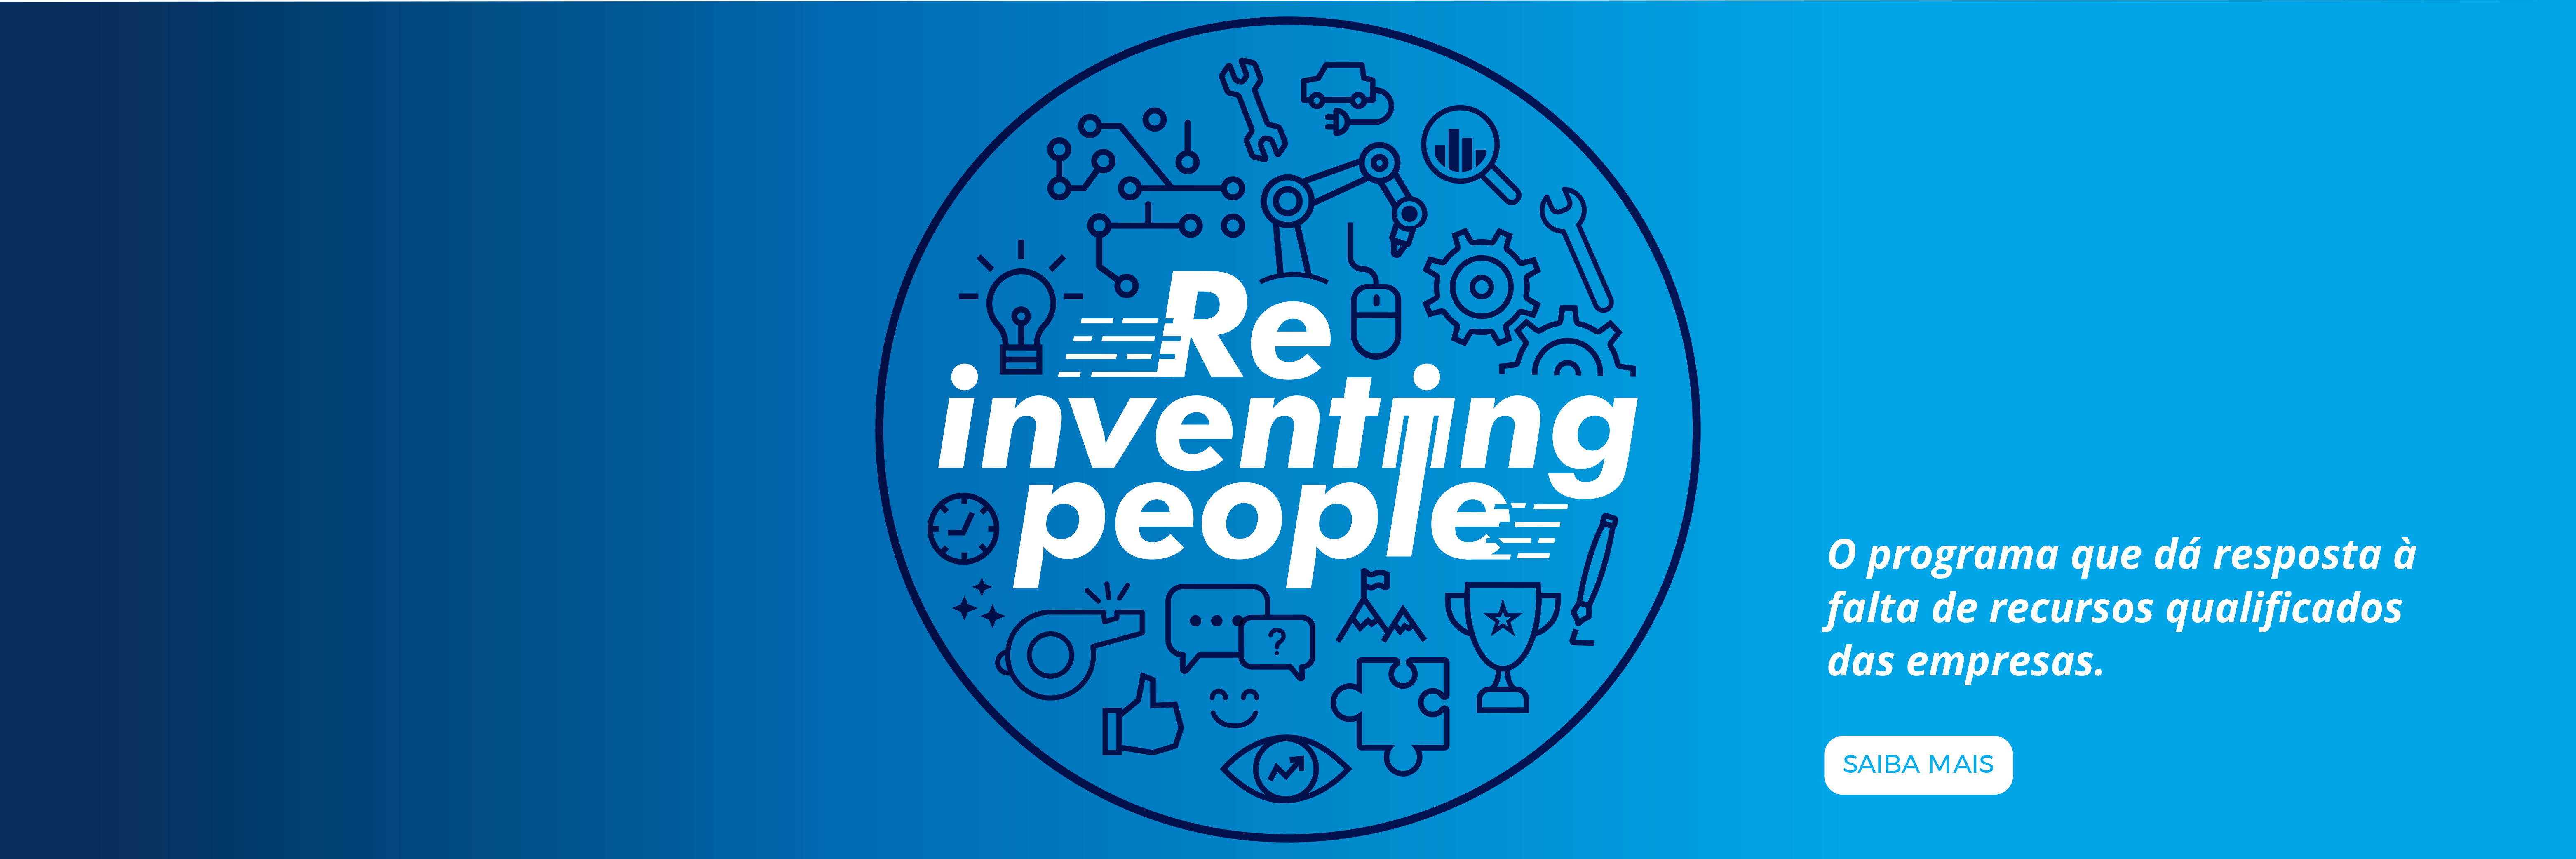 ATEC-Reinventing-People